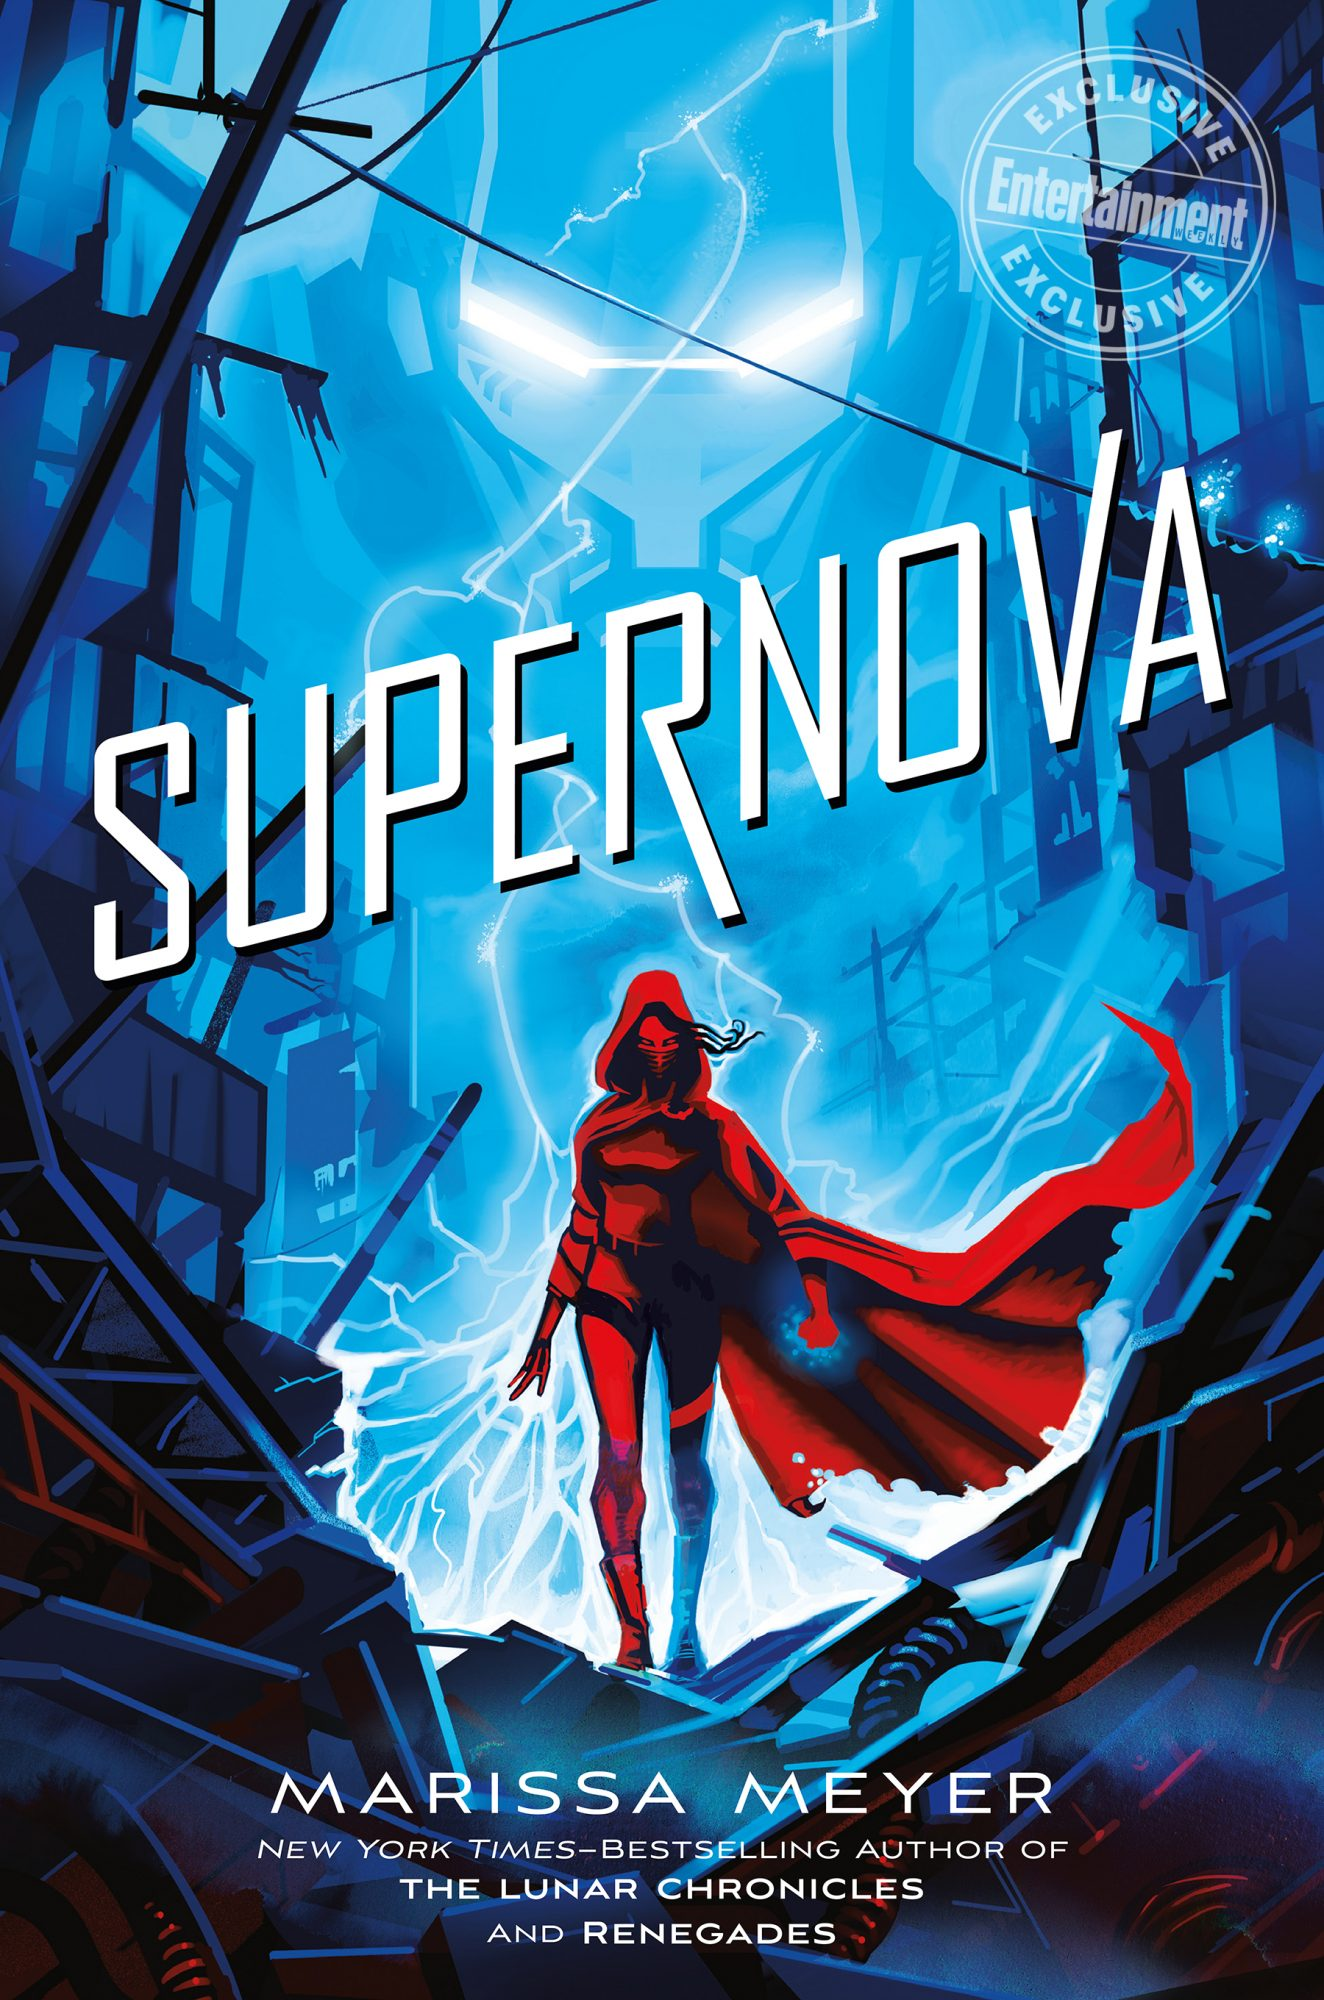 Supernova by Marissa Meyer